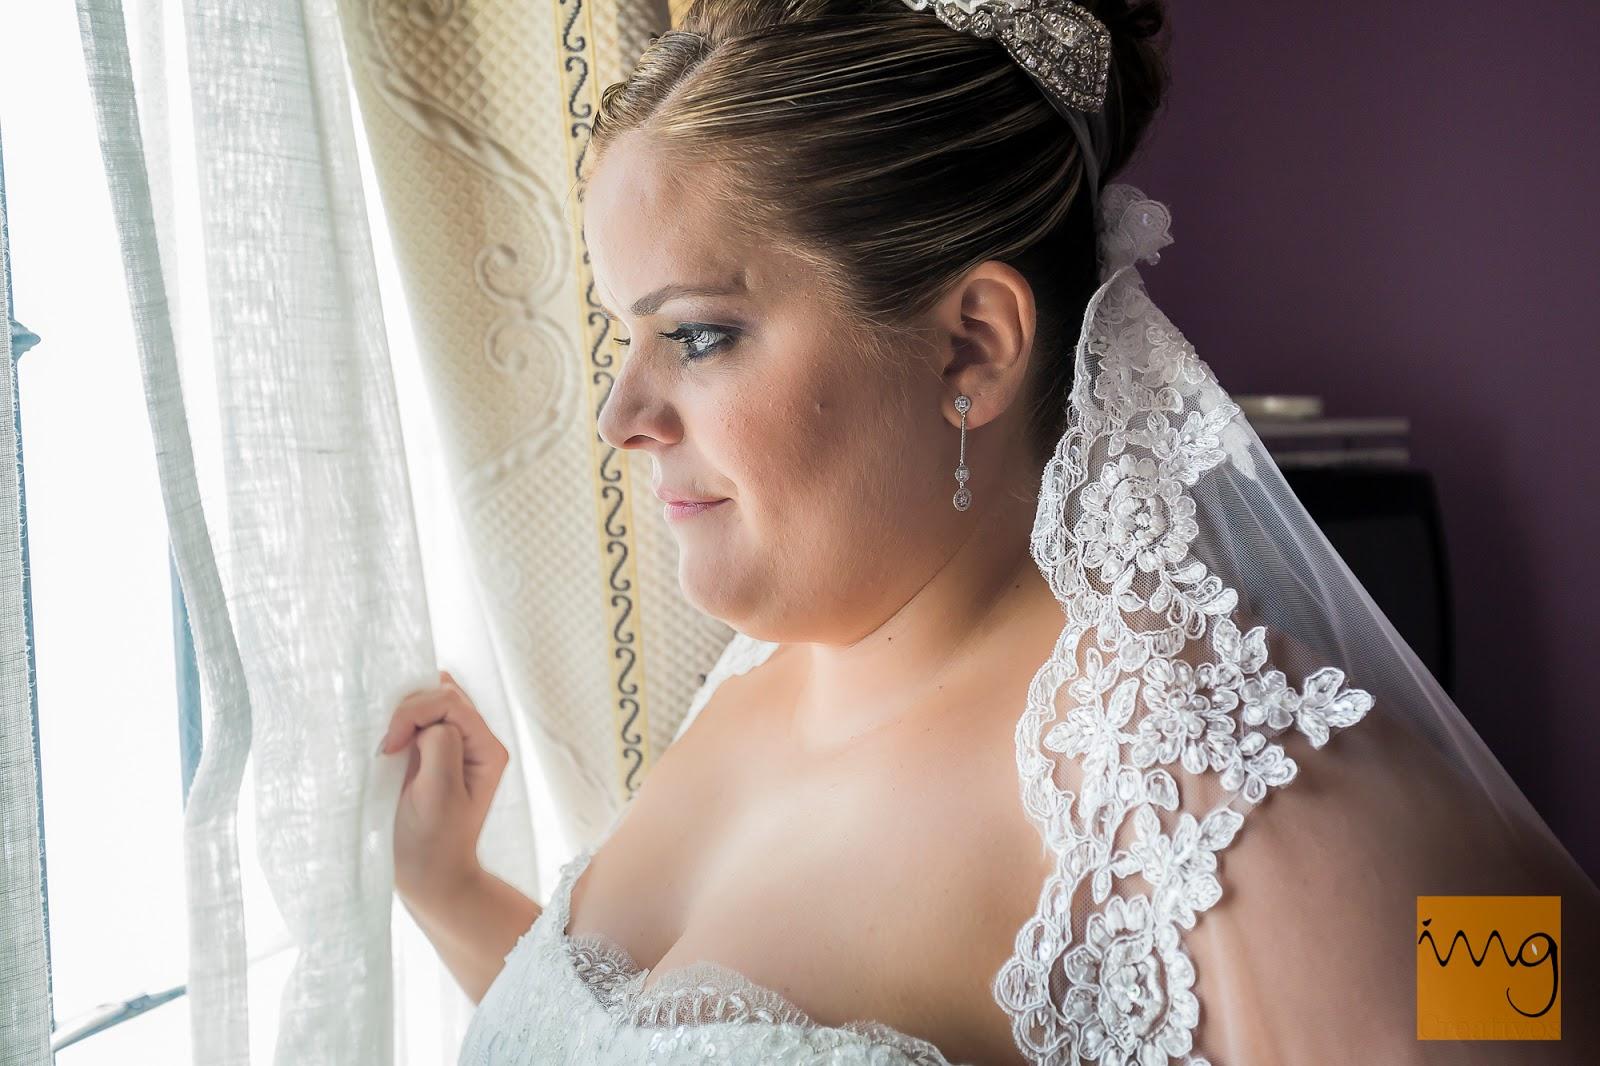 Retrato de boda frente a la ventana